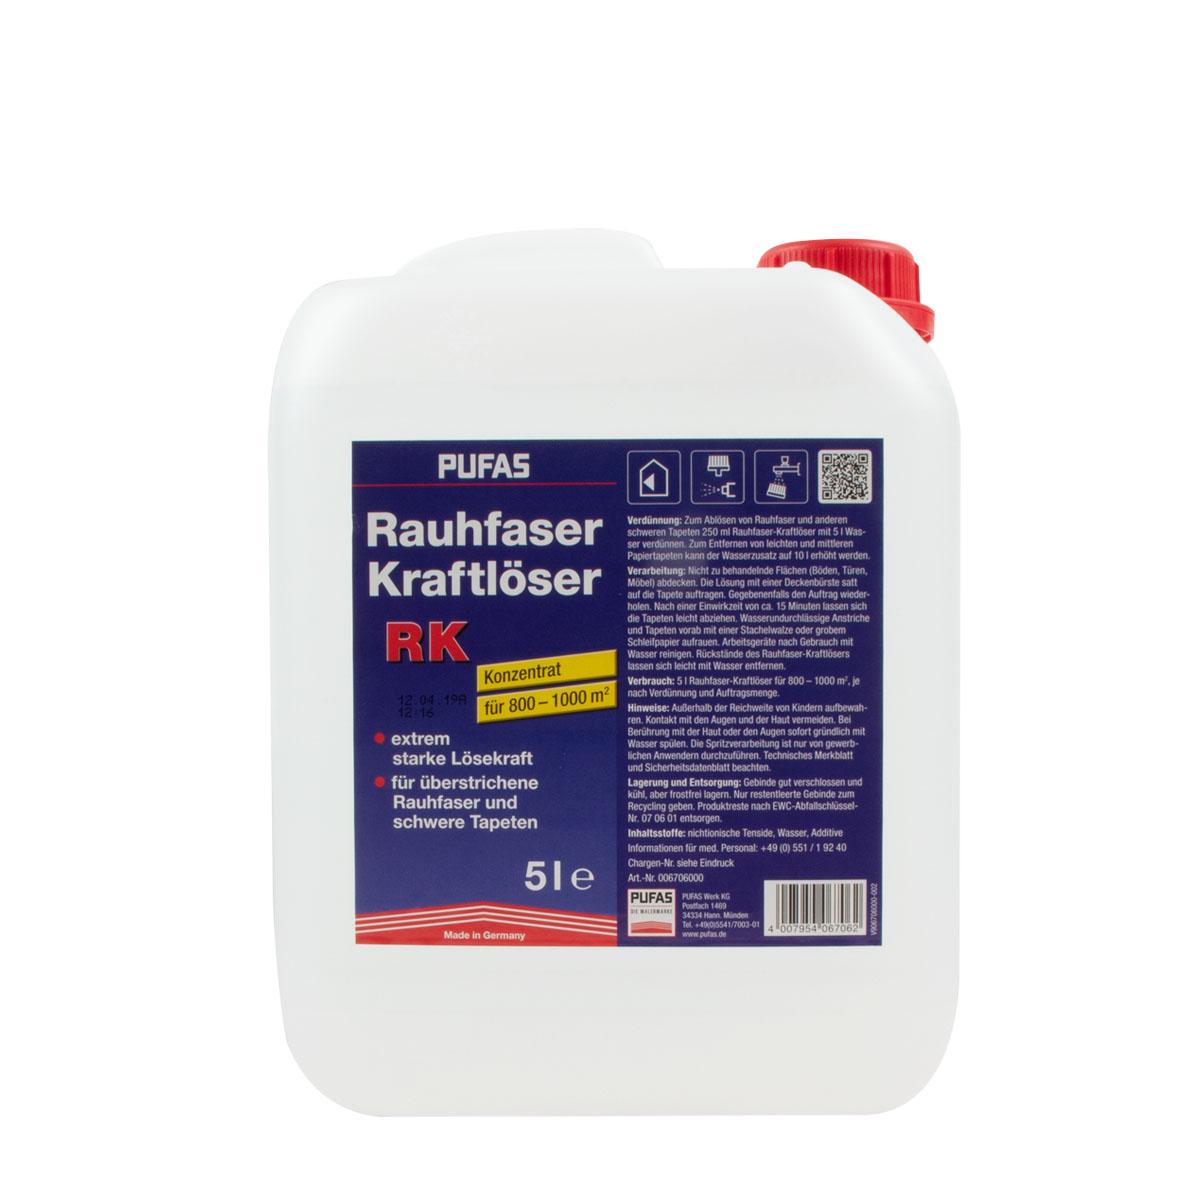 Pufas Rauhfaser-KRAFT-Ablöser 5L, Tapetenlöser